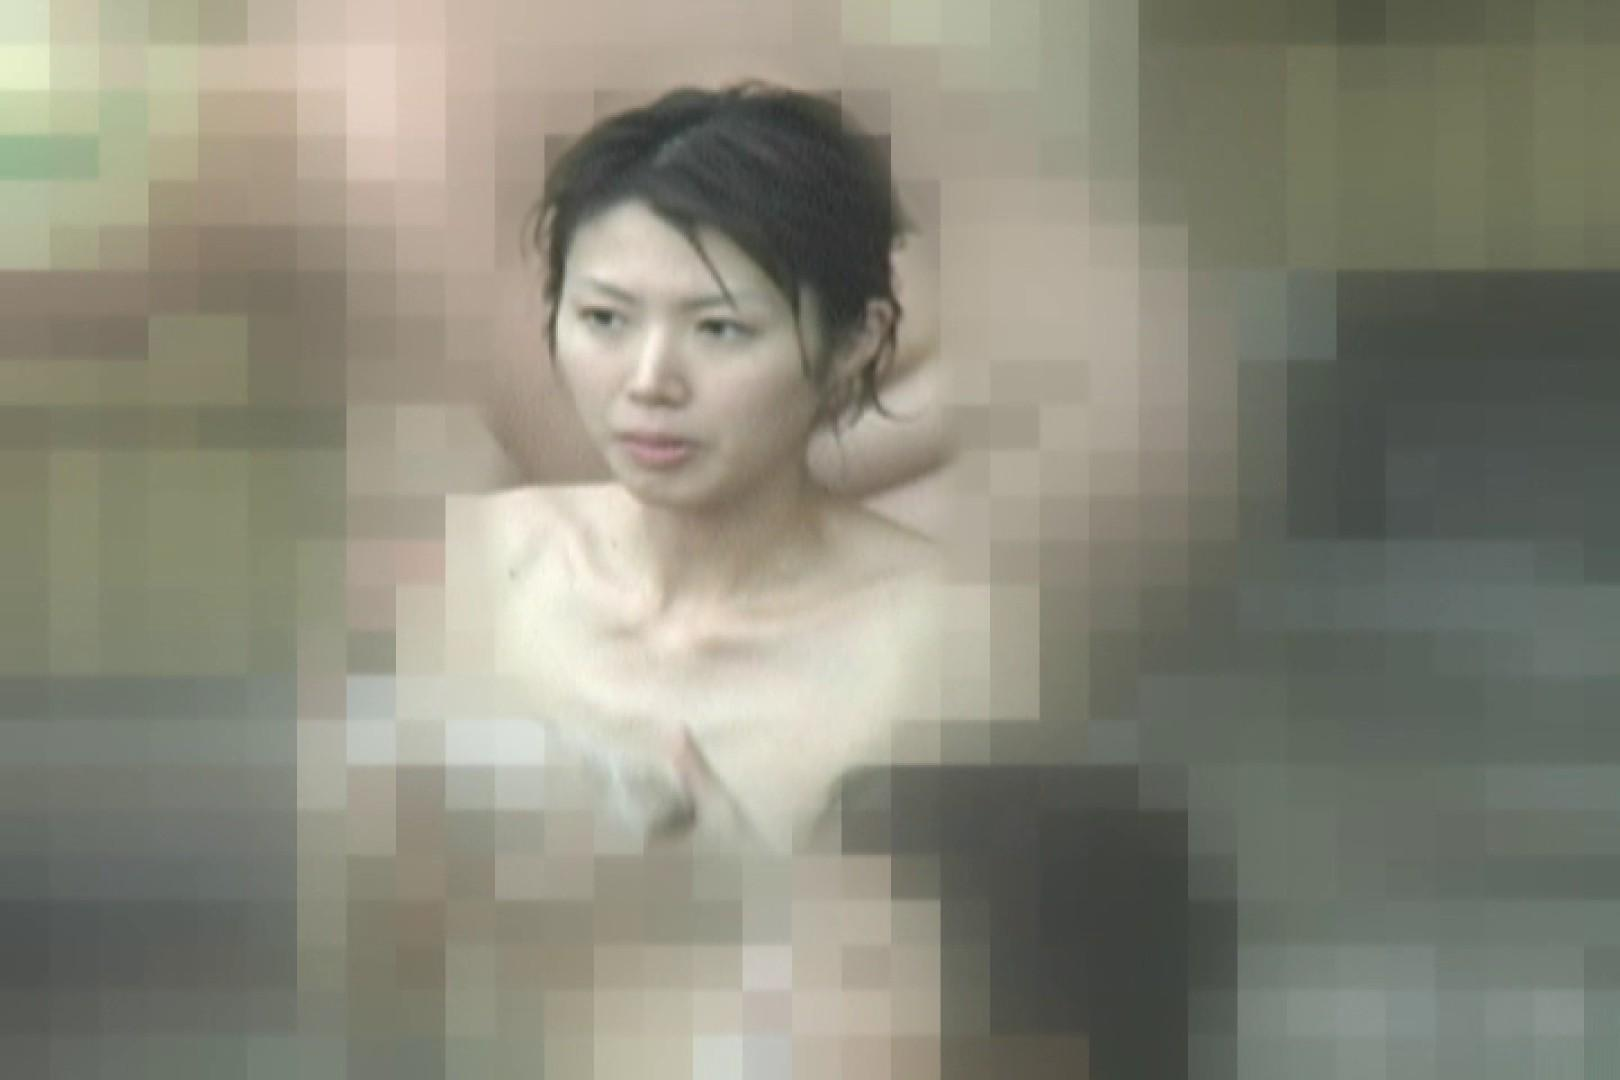 Aquaな露天風呂Vol.856 0 | 0  41連発 1